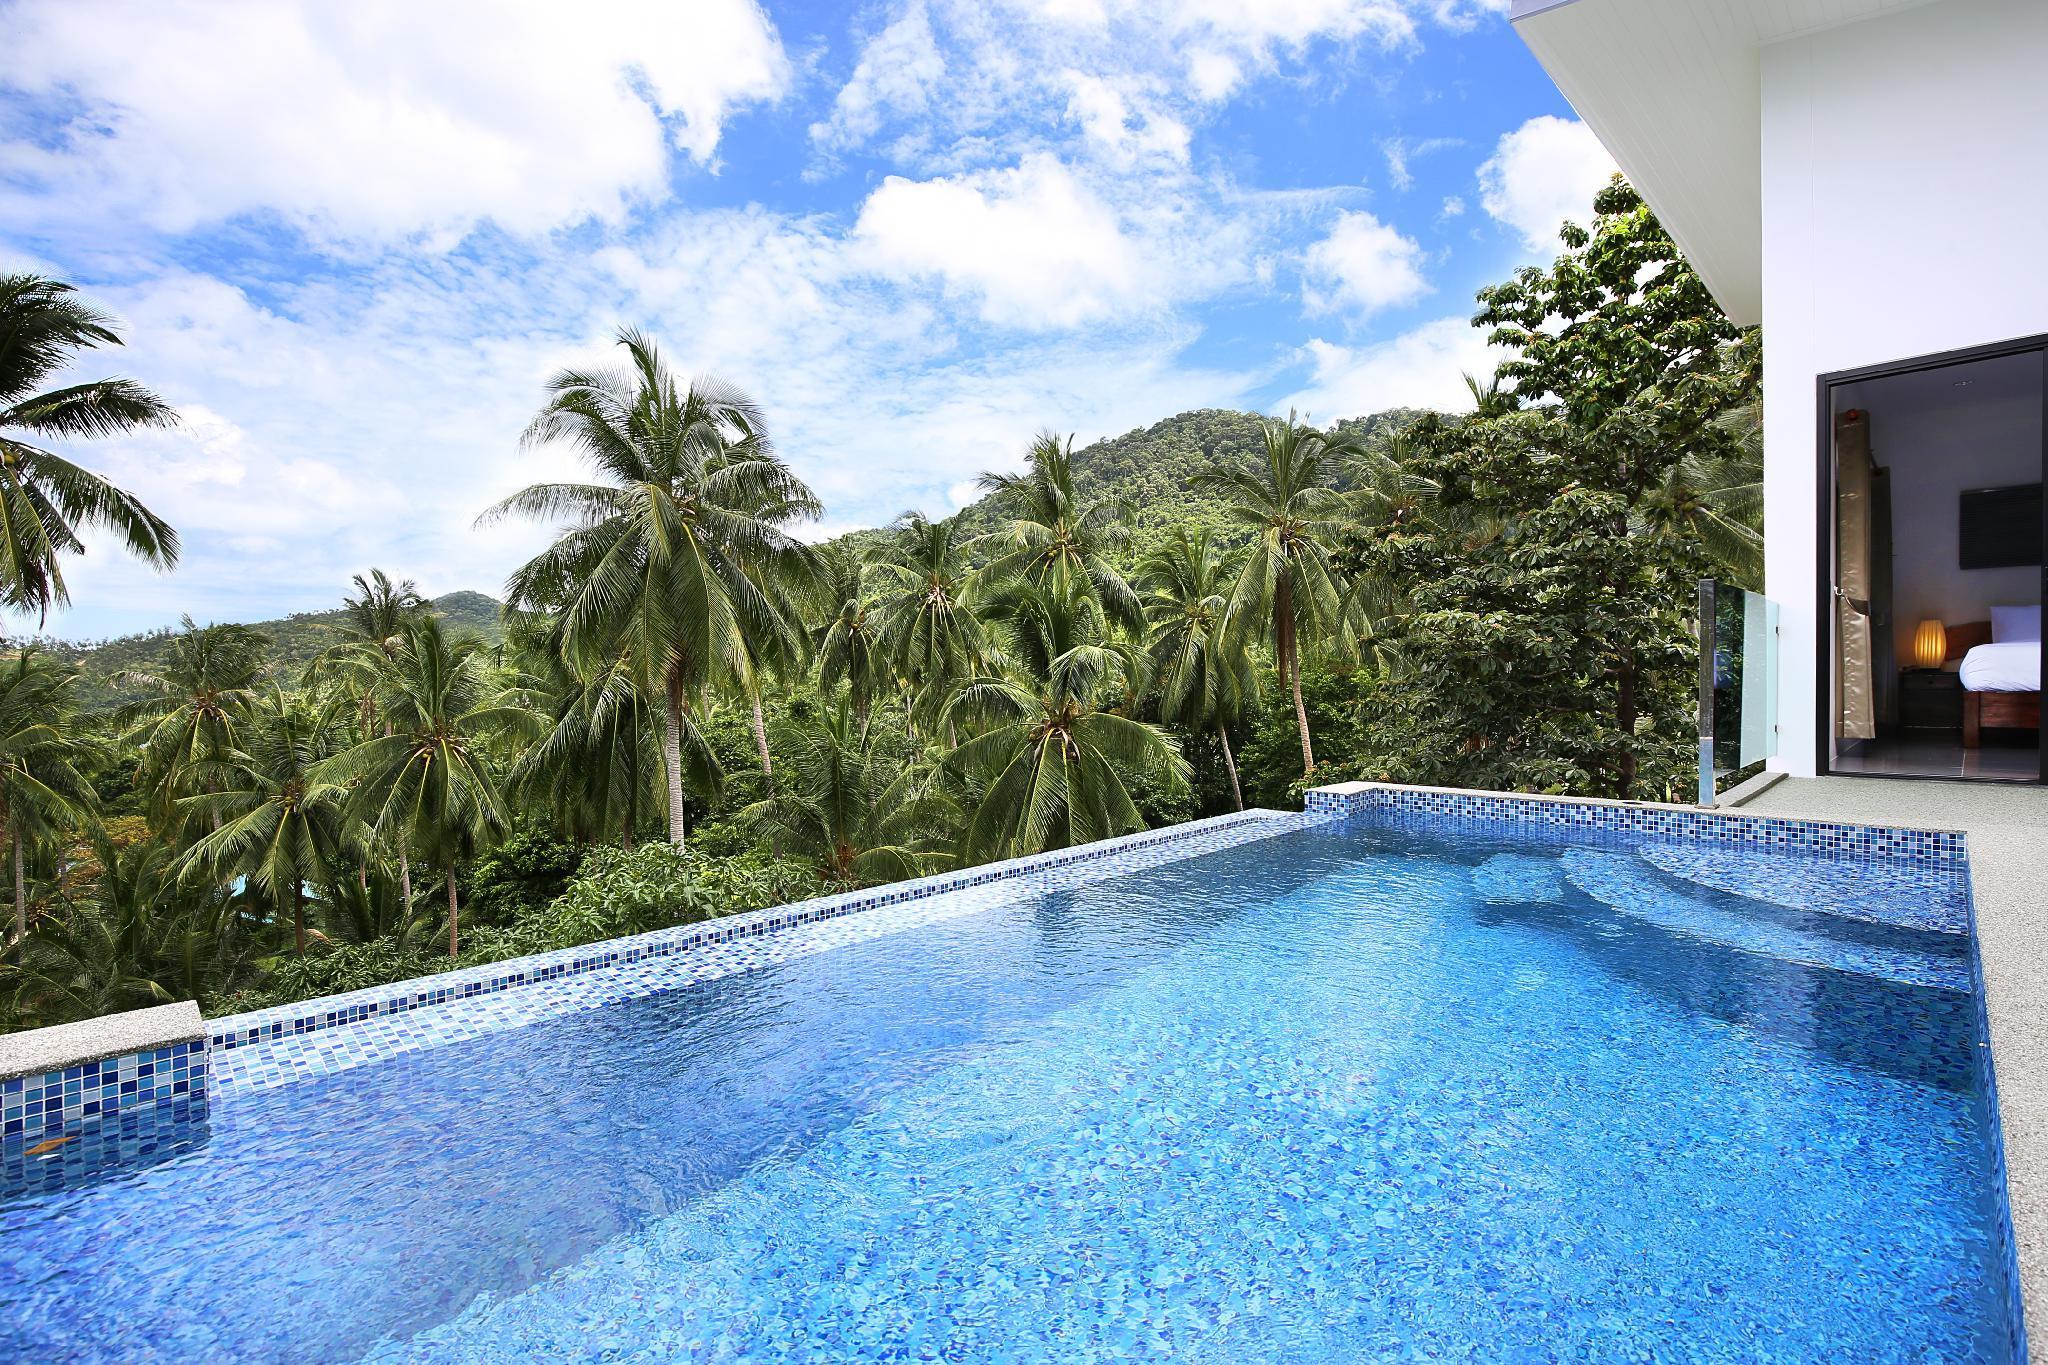 1 Bedroom Luxury Villa With Swimming Pool